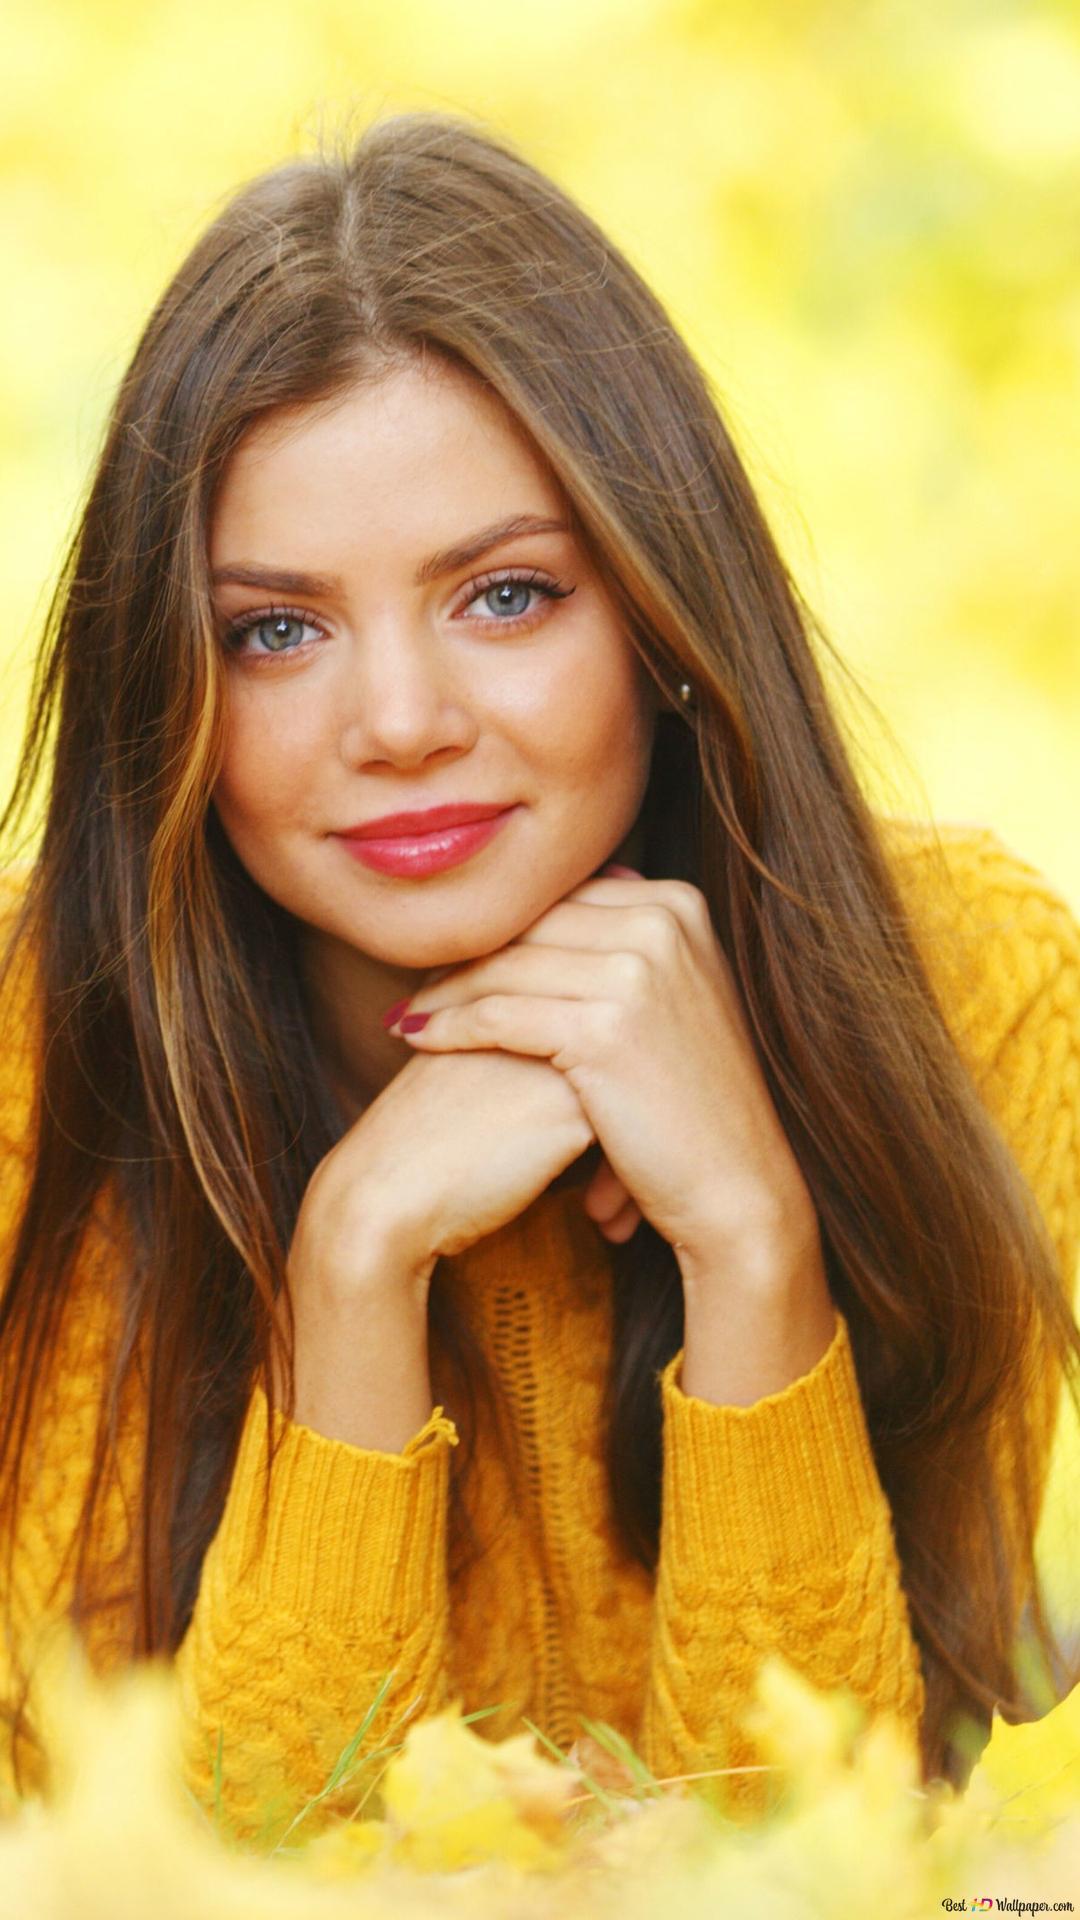 pretty girl hd wallpaper download